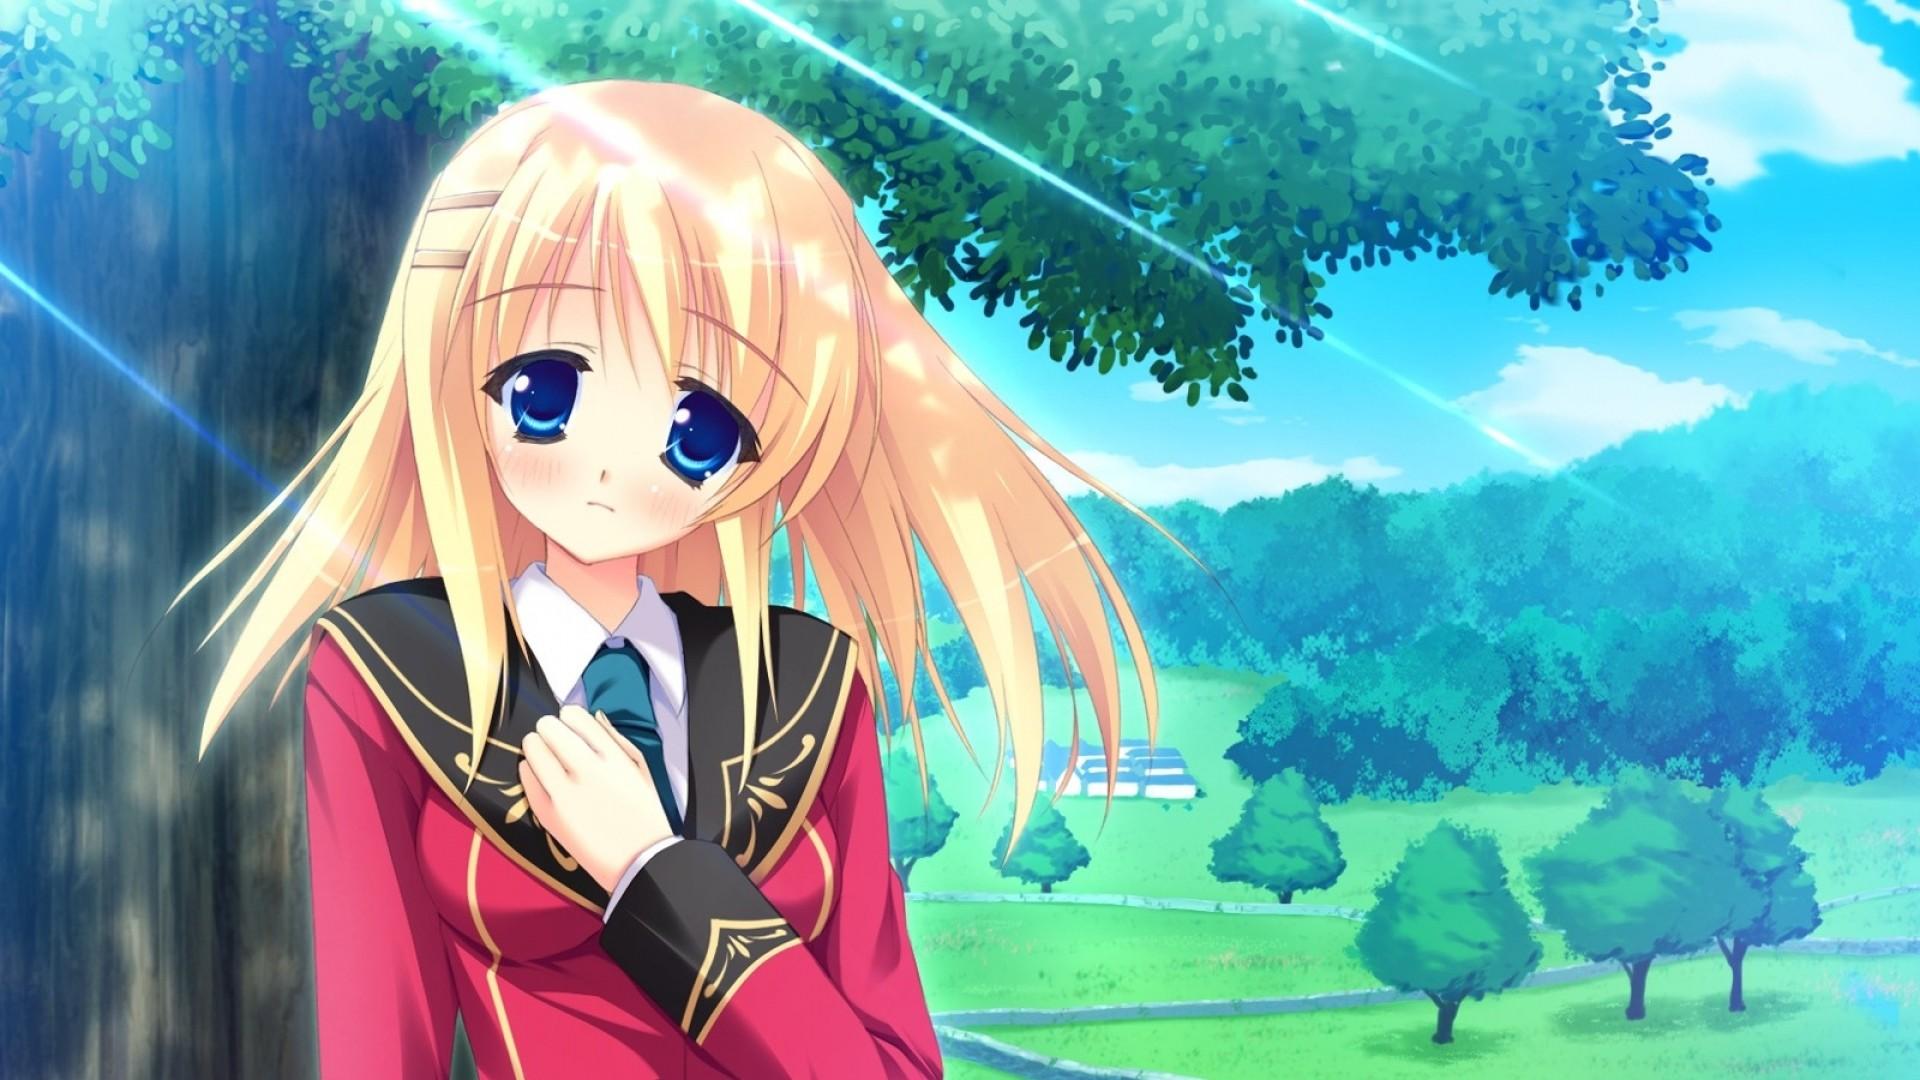 Wallpaper anime, girl, sad, tree, park, spring